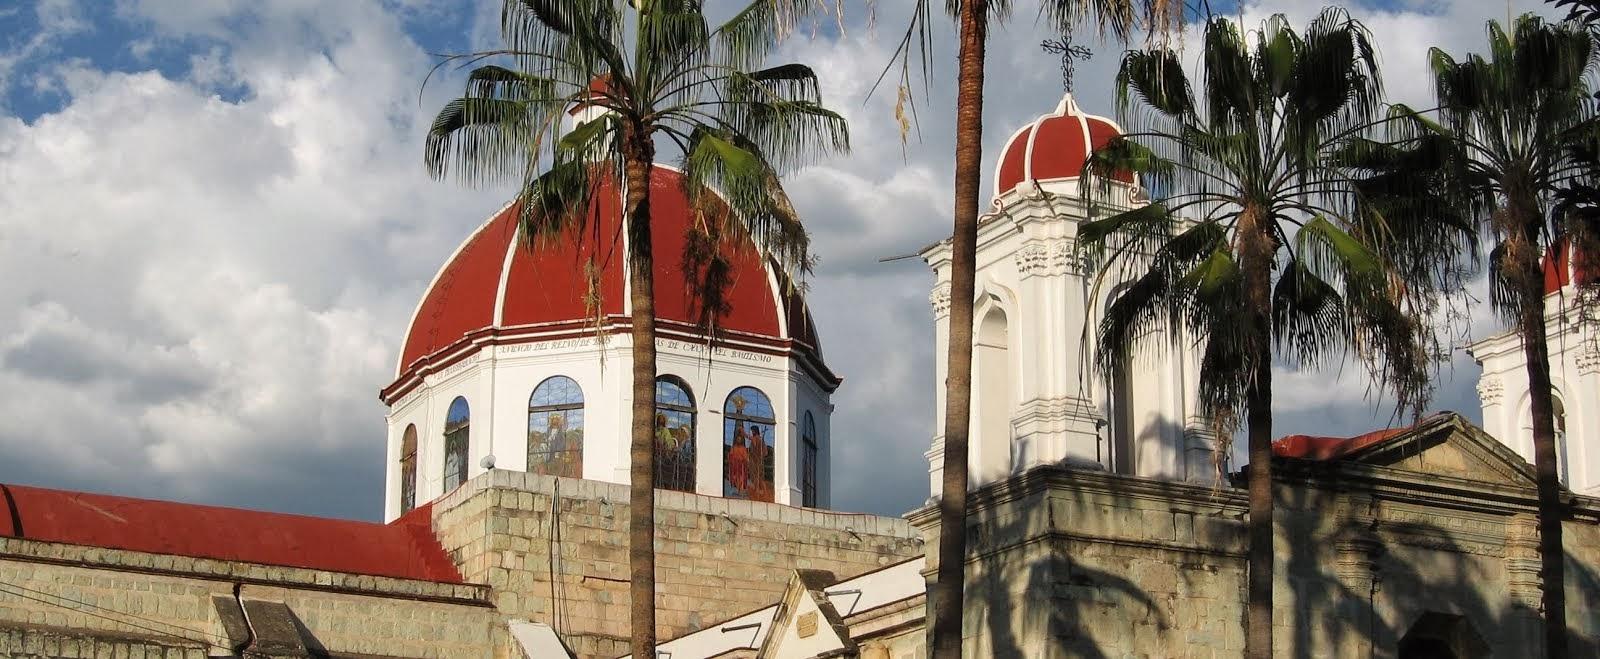 Iglesia de Guadalupe, Oaxaca, Mexico